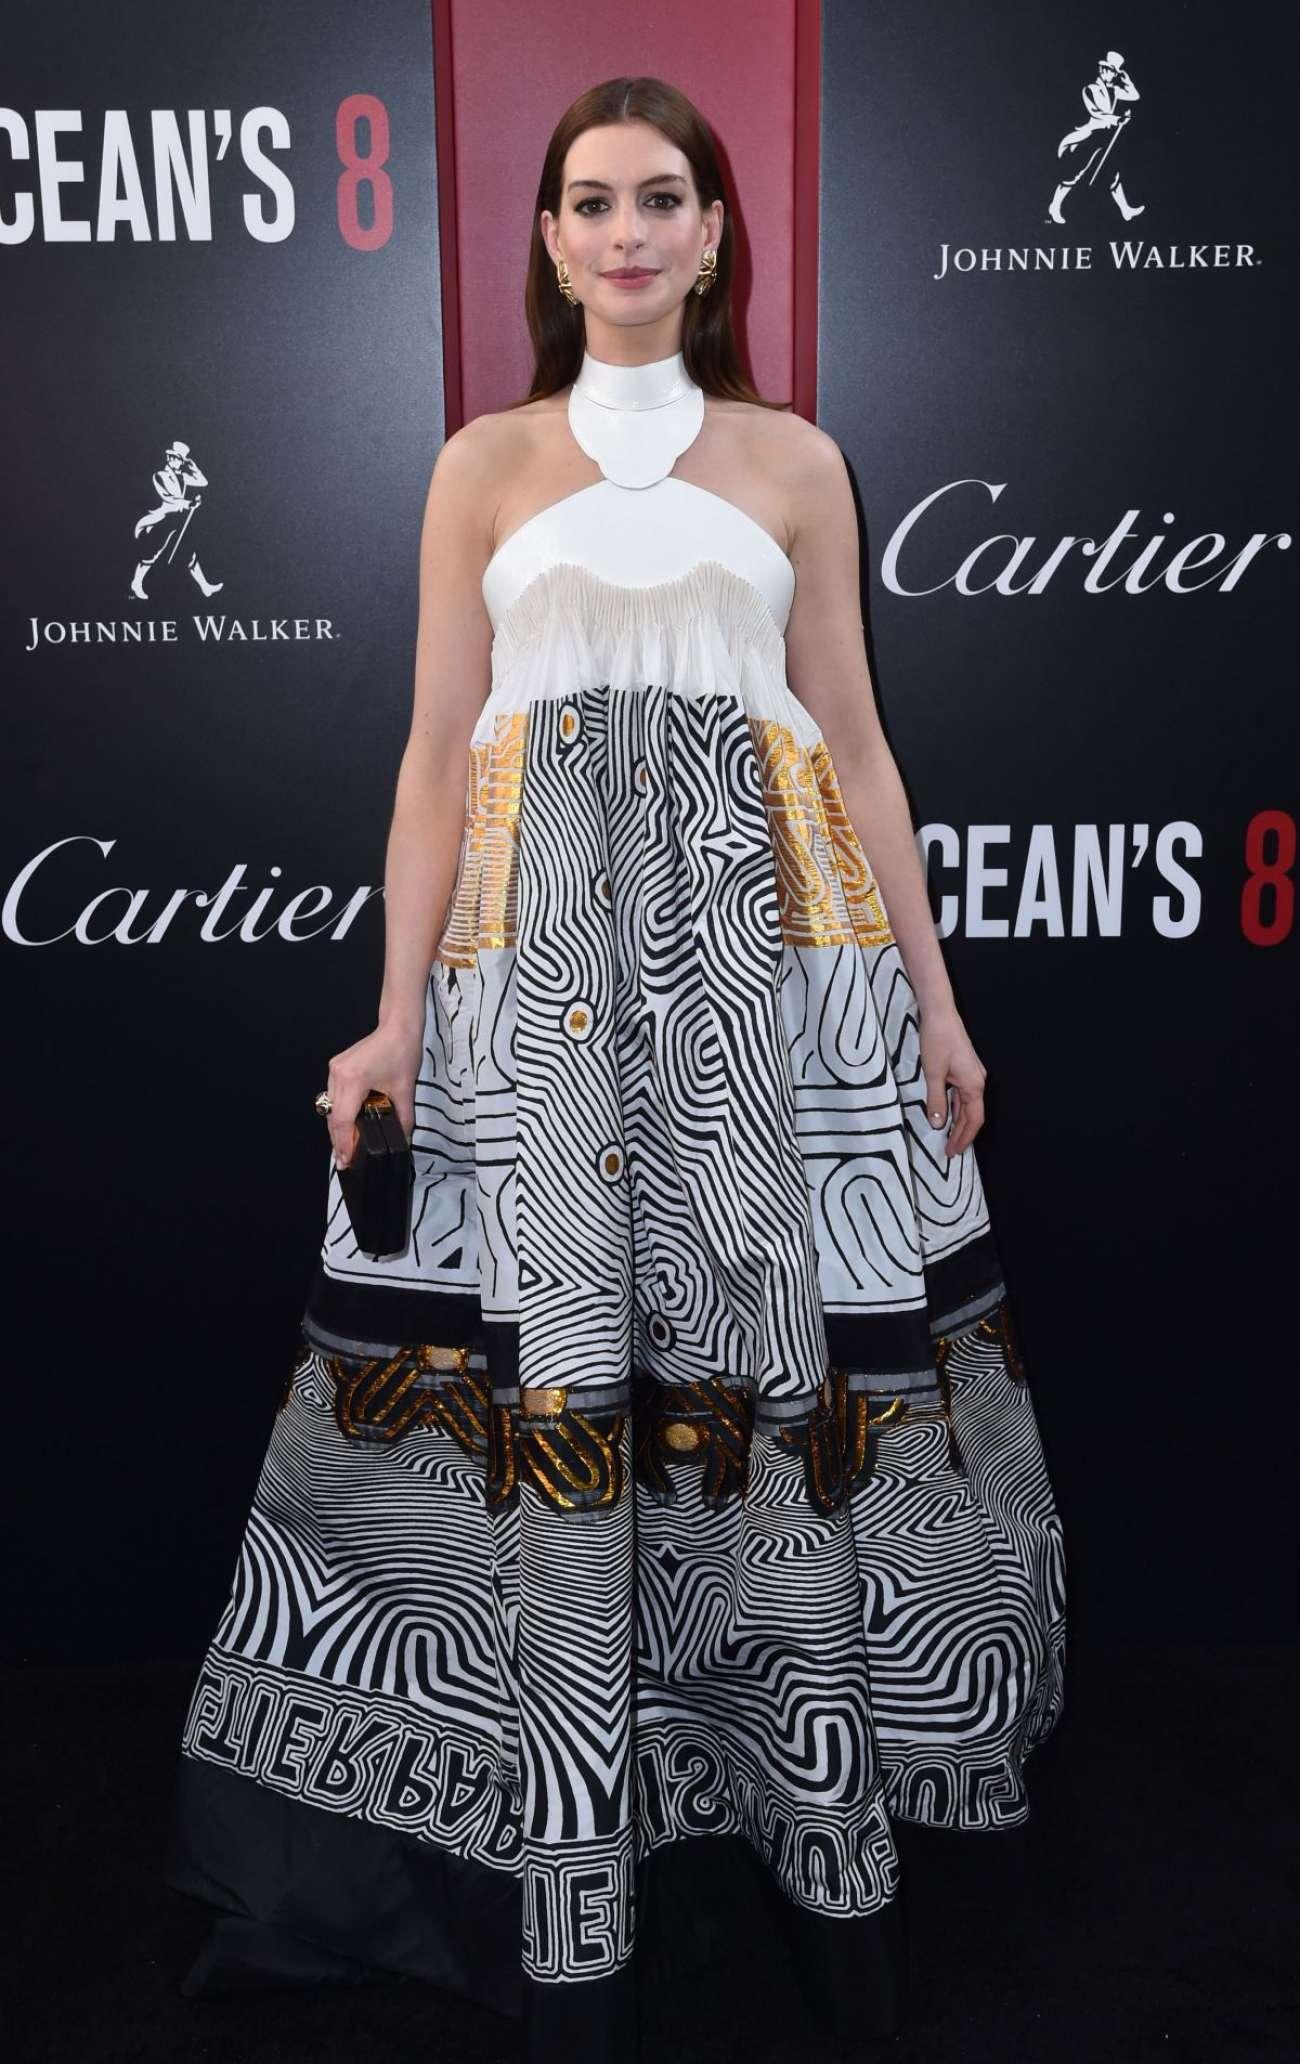 Anne Hathaway 2018 : Anne Hathaway: Ocean's 8 Premiere photocall In New York-14